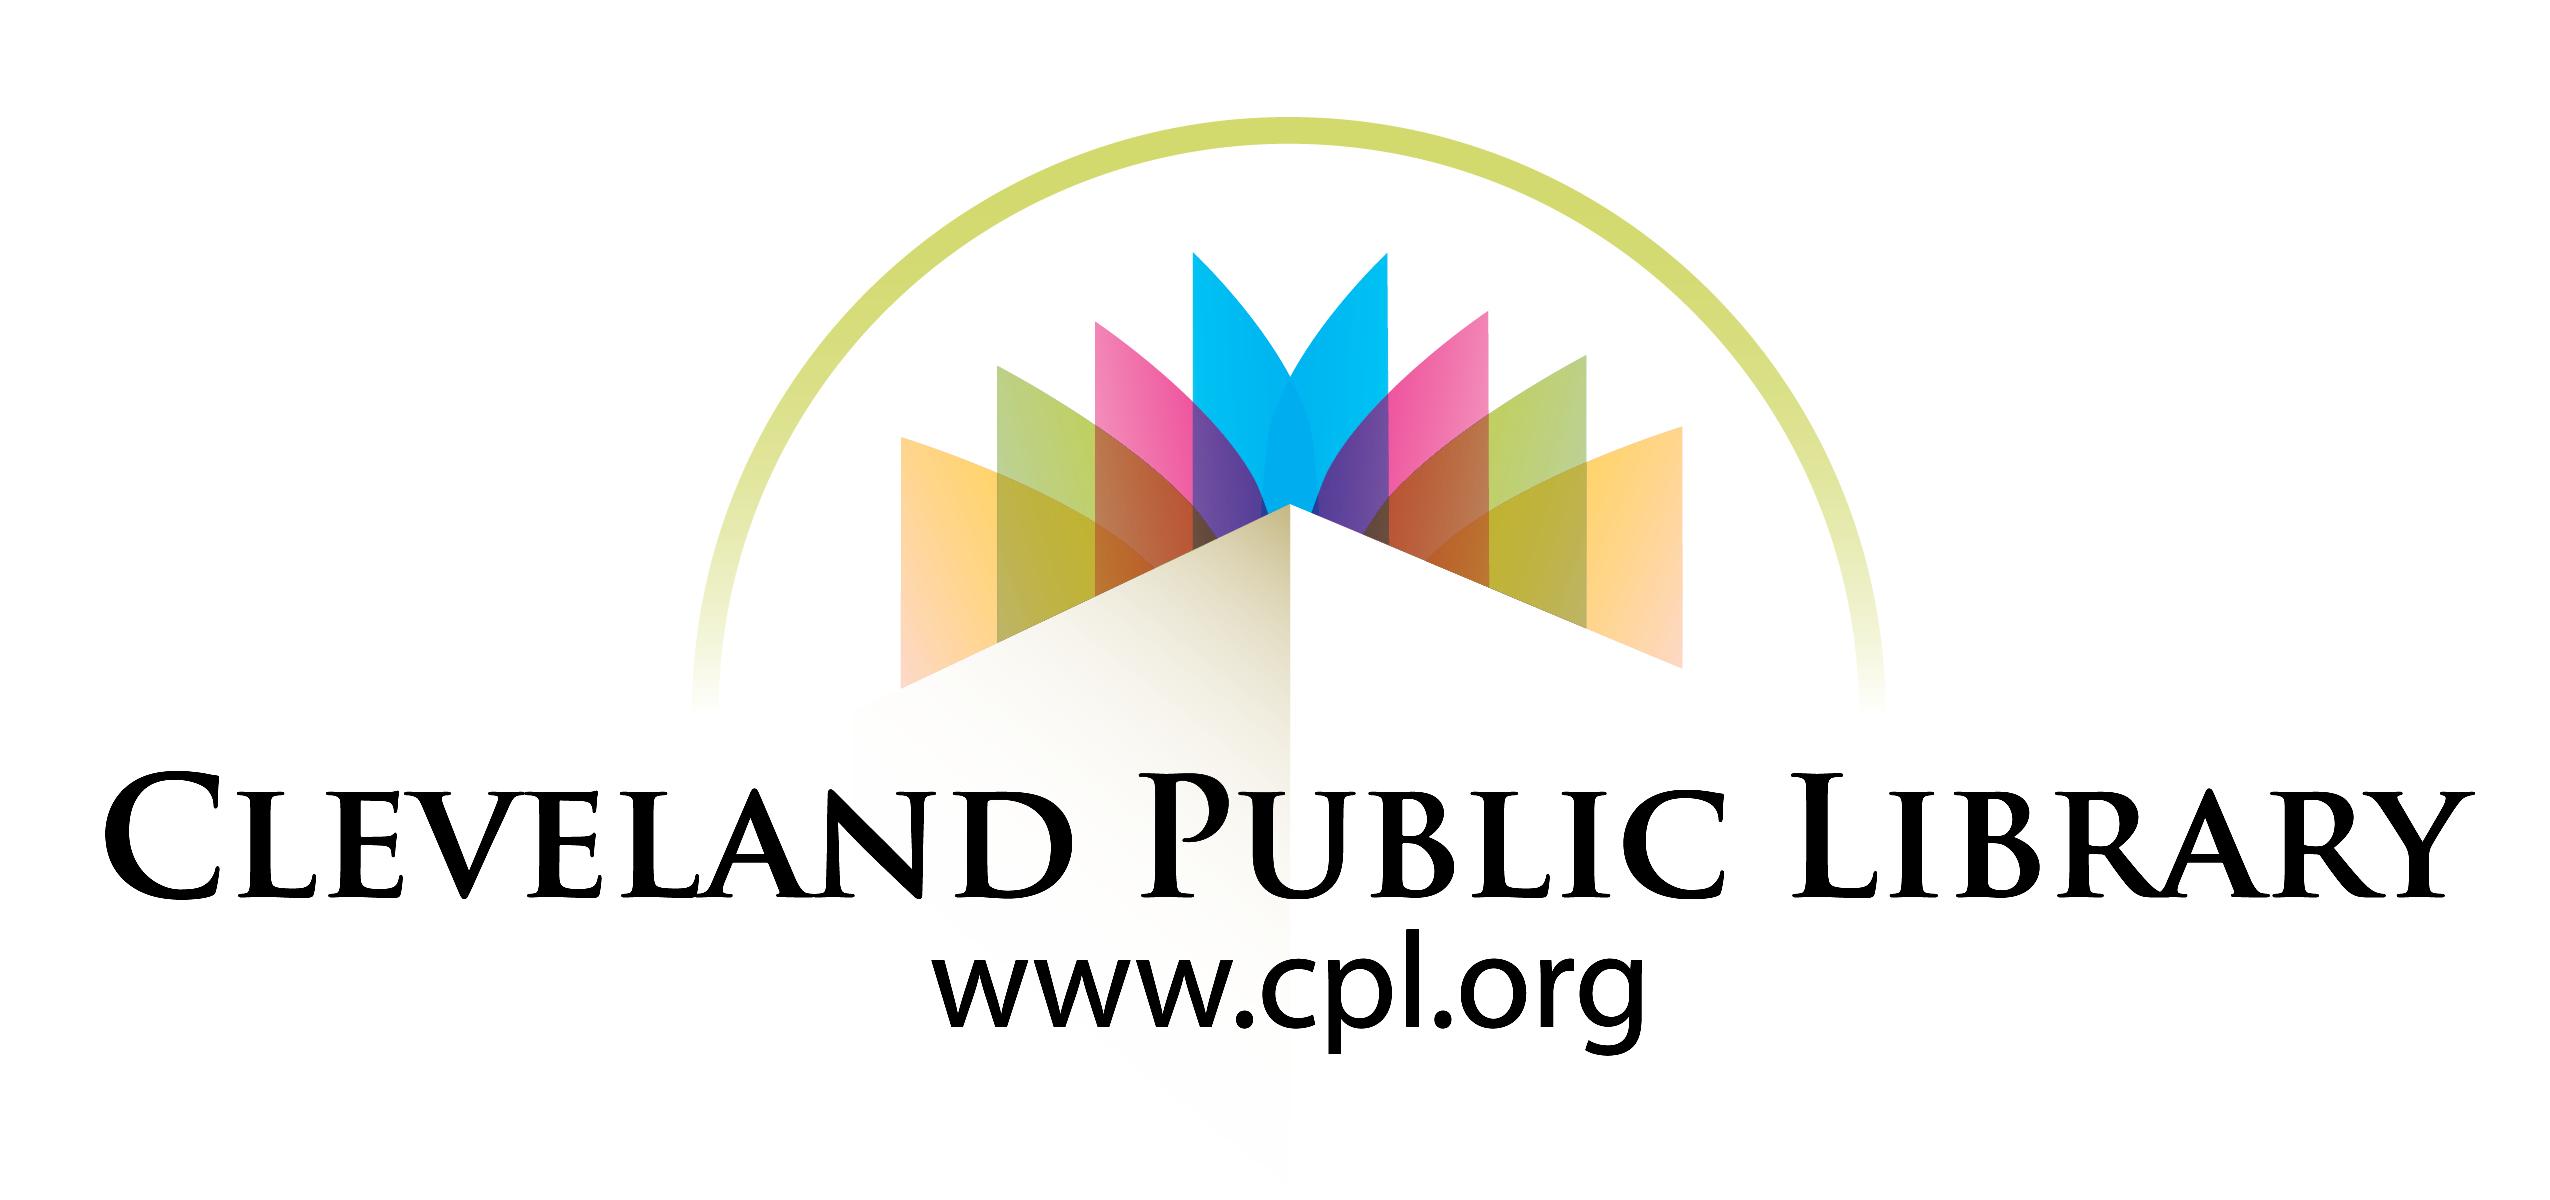 Cleveland Public Library logo 04.21.15